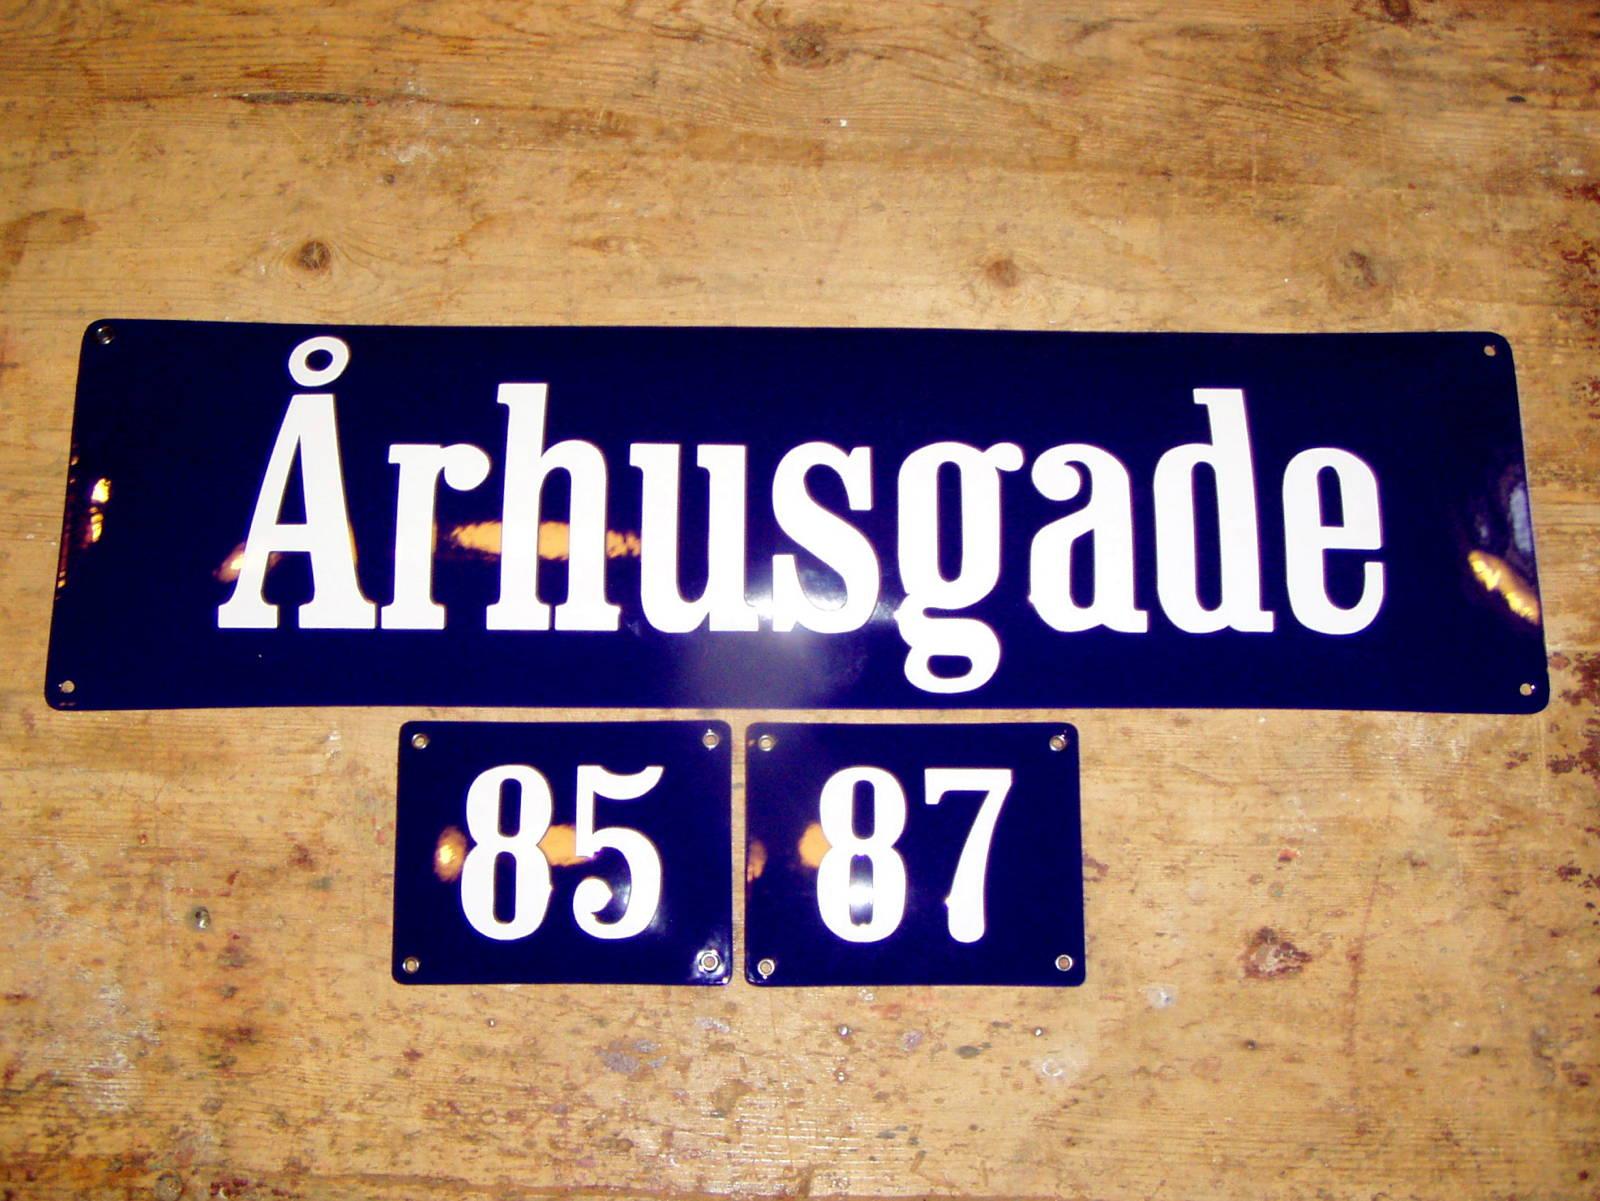 Aarhusgade-p1010166-web1600